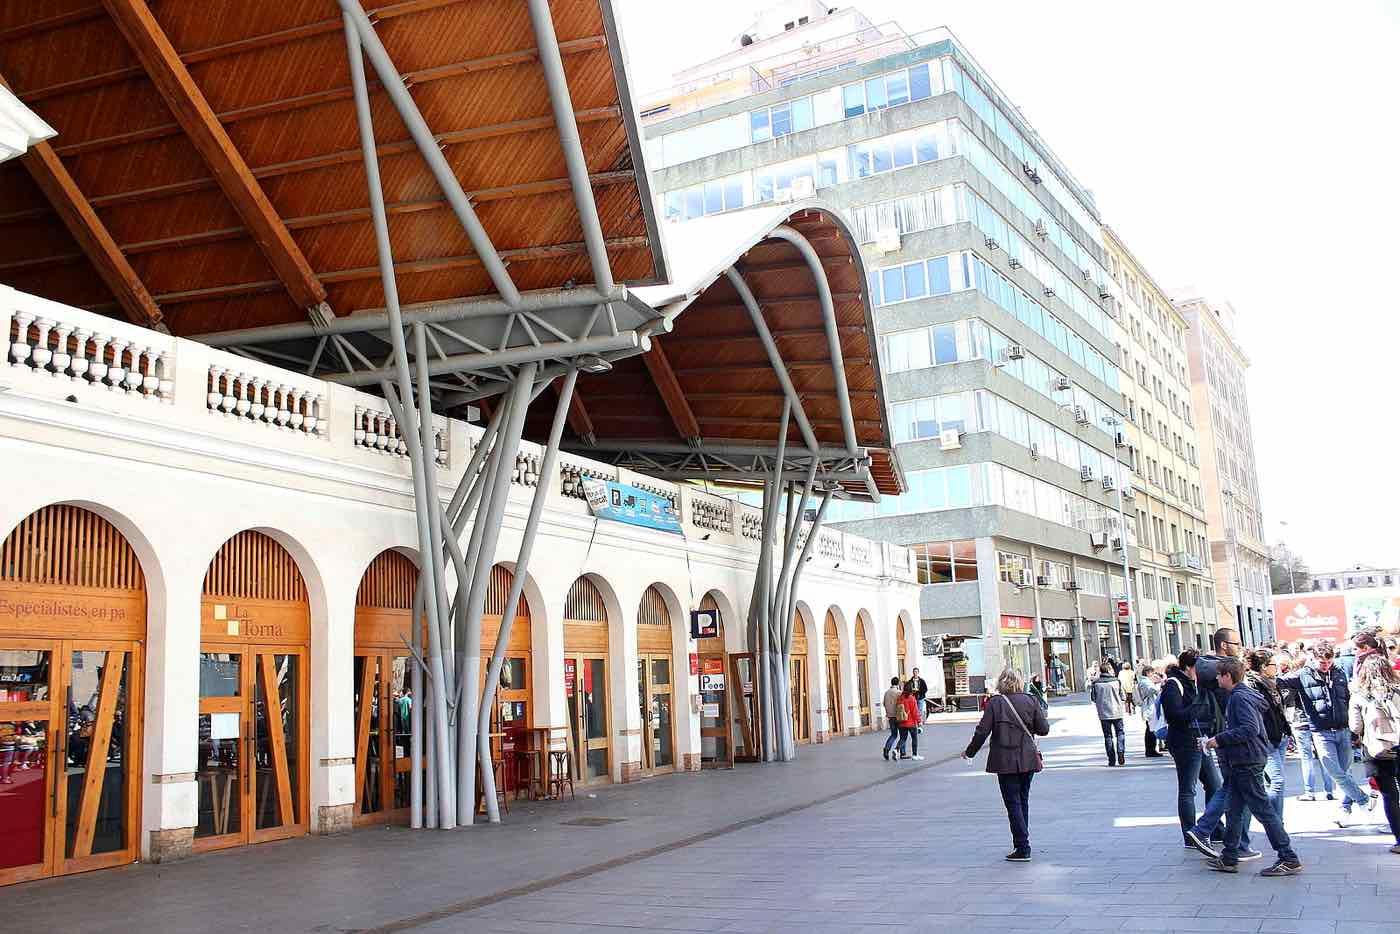 sant caterina market hidden gems barcelona